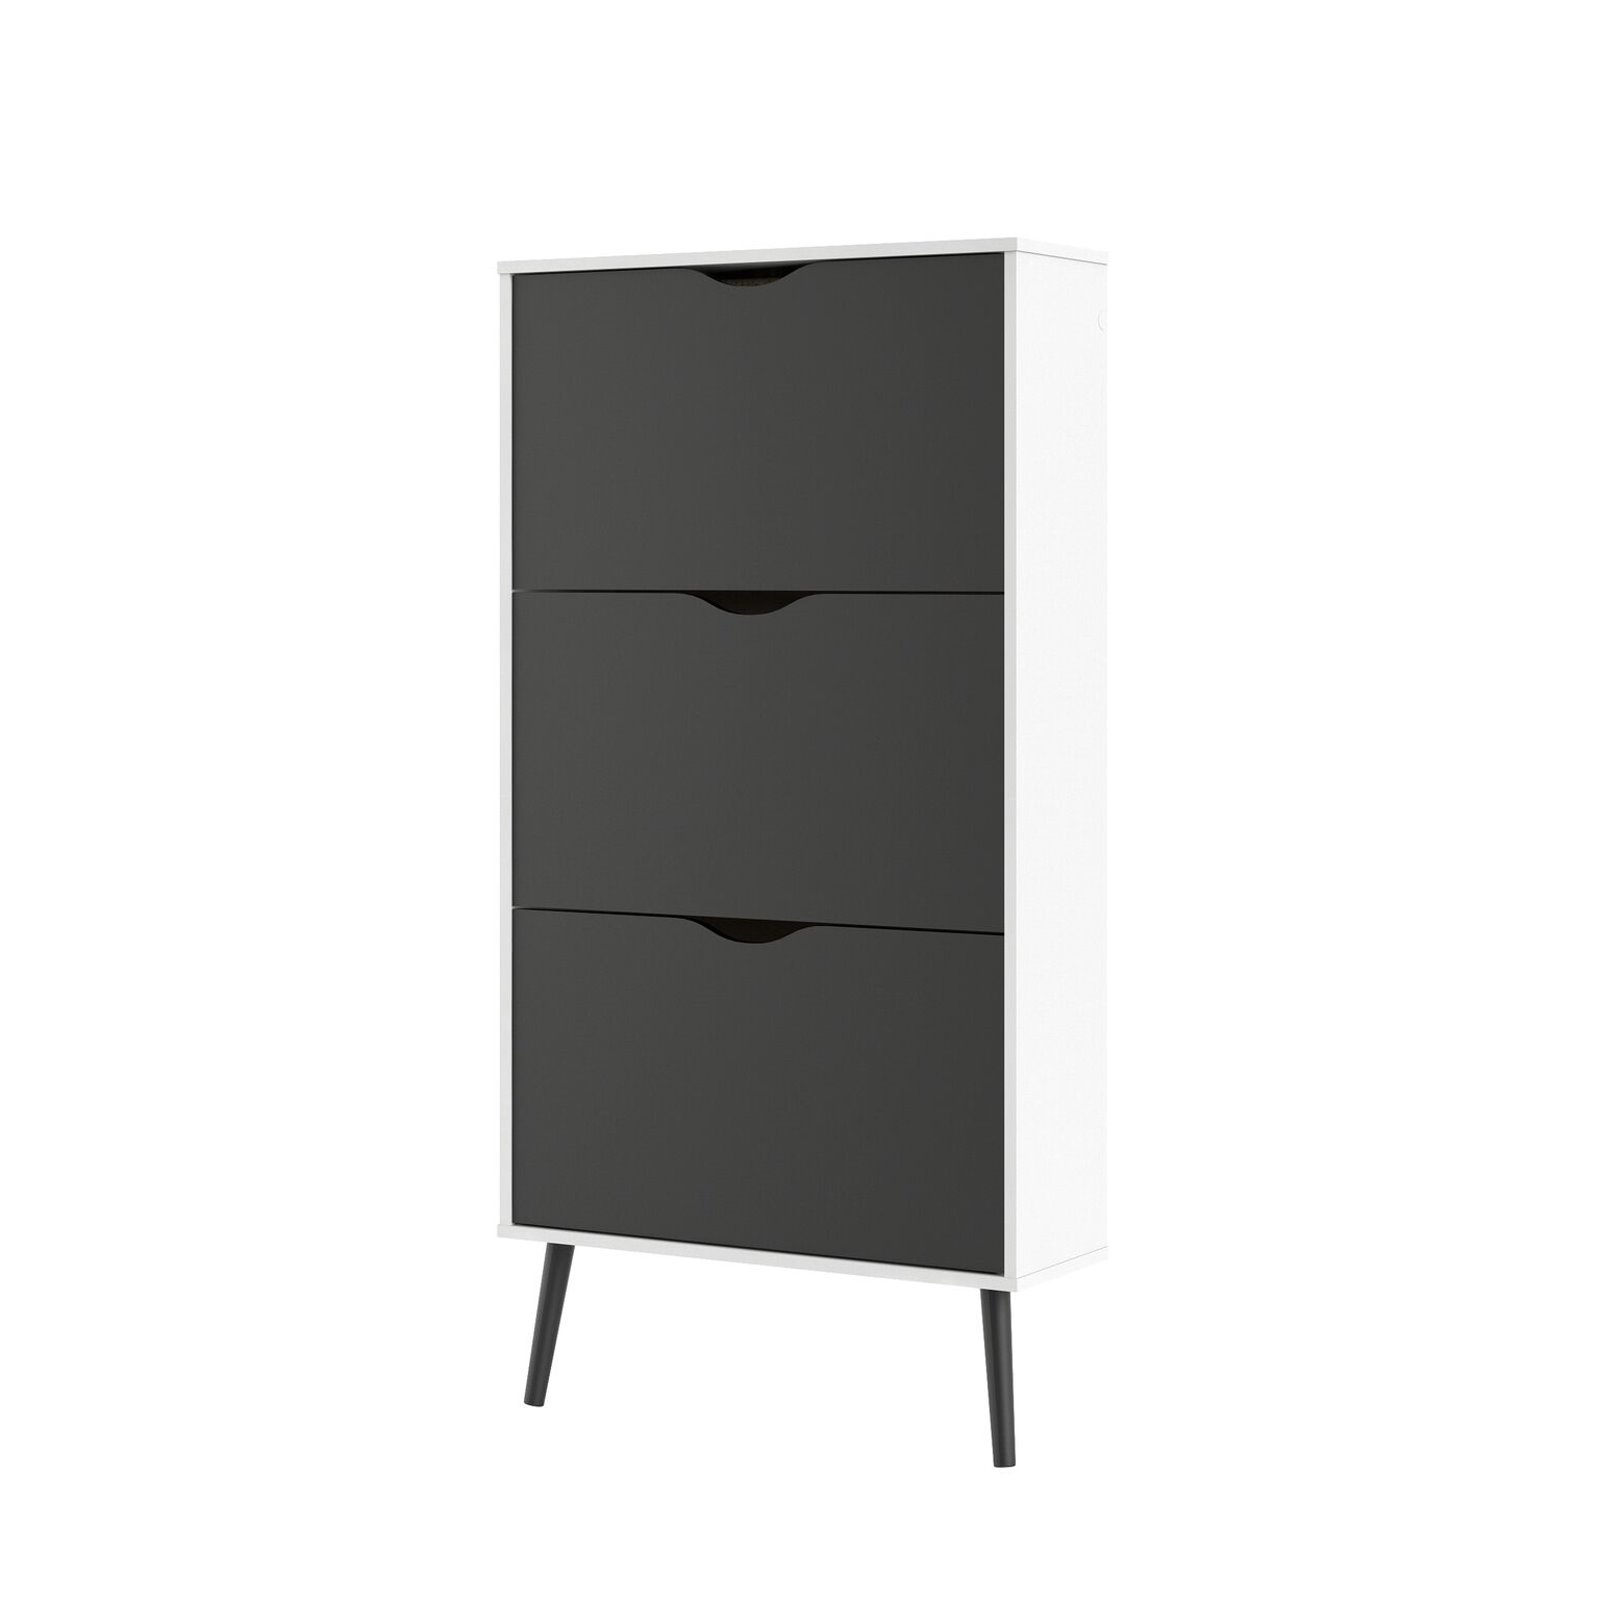 schuhschrank napoli schuhkipper schuhregal flur dielen. Black Bedroom Furniture Sets. Home Design Ideas